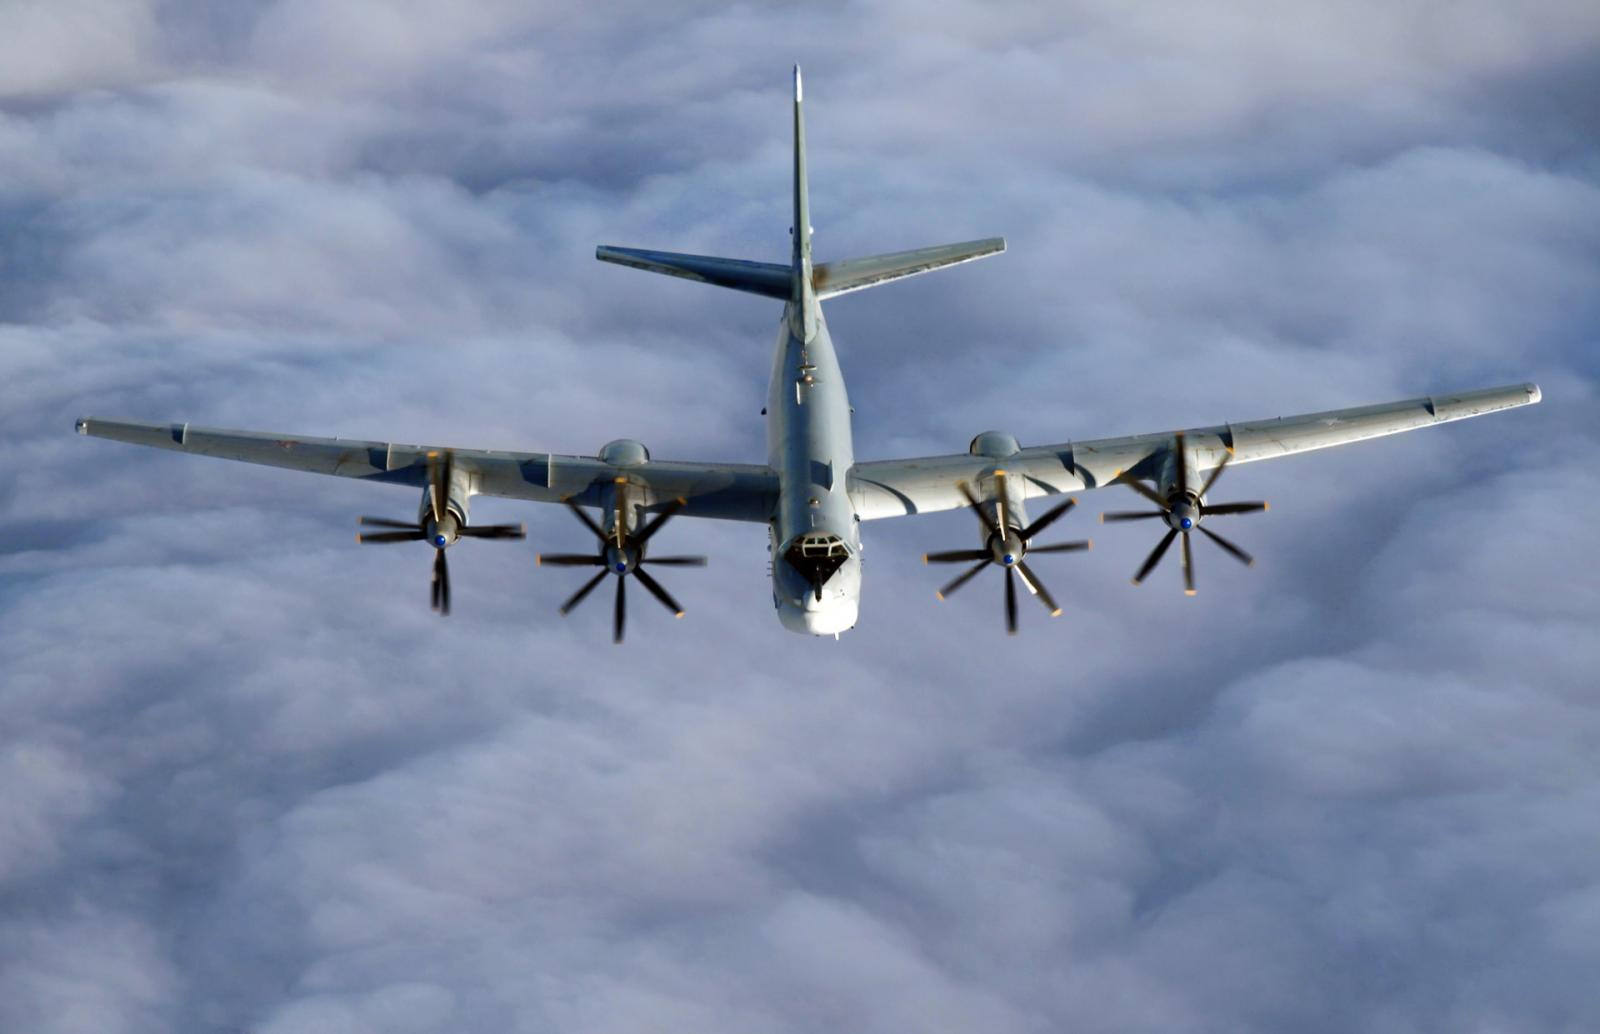 Миссия ОБСЕ заметила летящий над Донбассом бомбардировщик